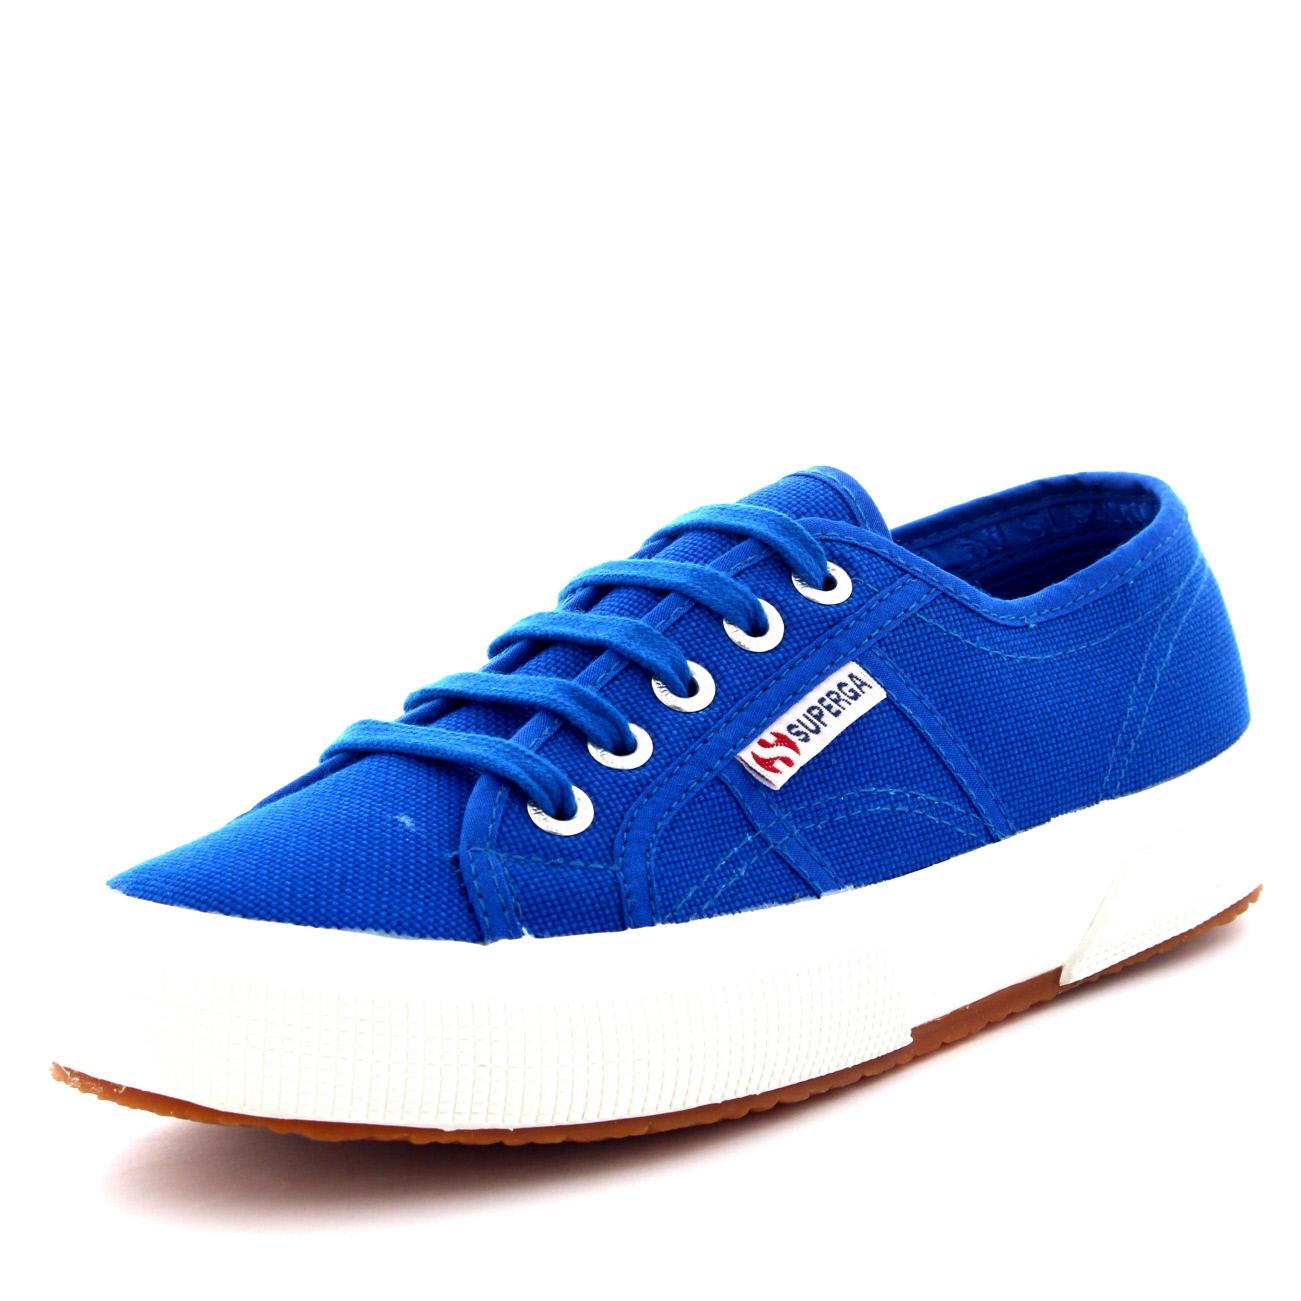 Ladies Superga 2750 Cotu Classic Canvas Pumps Tennis Shoes Trainers All Sizes | EBay